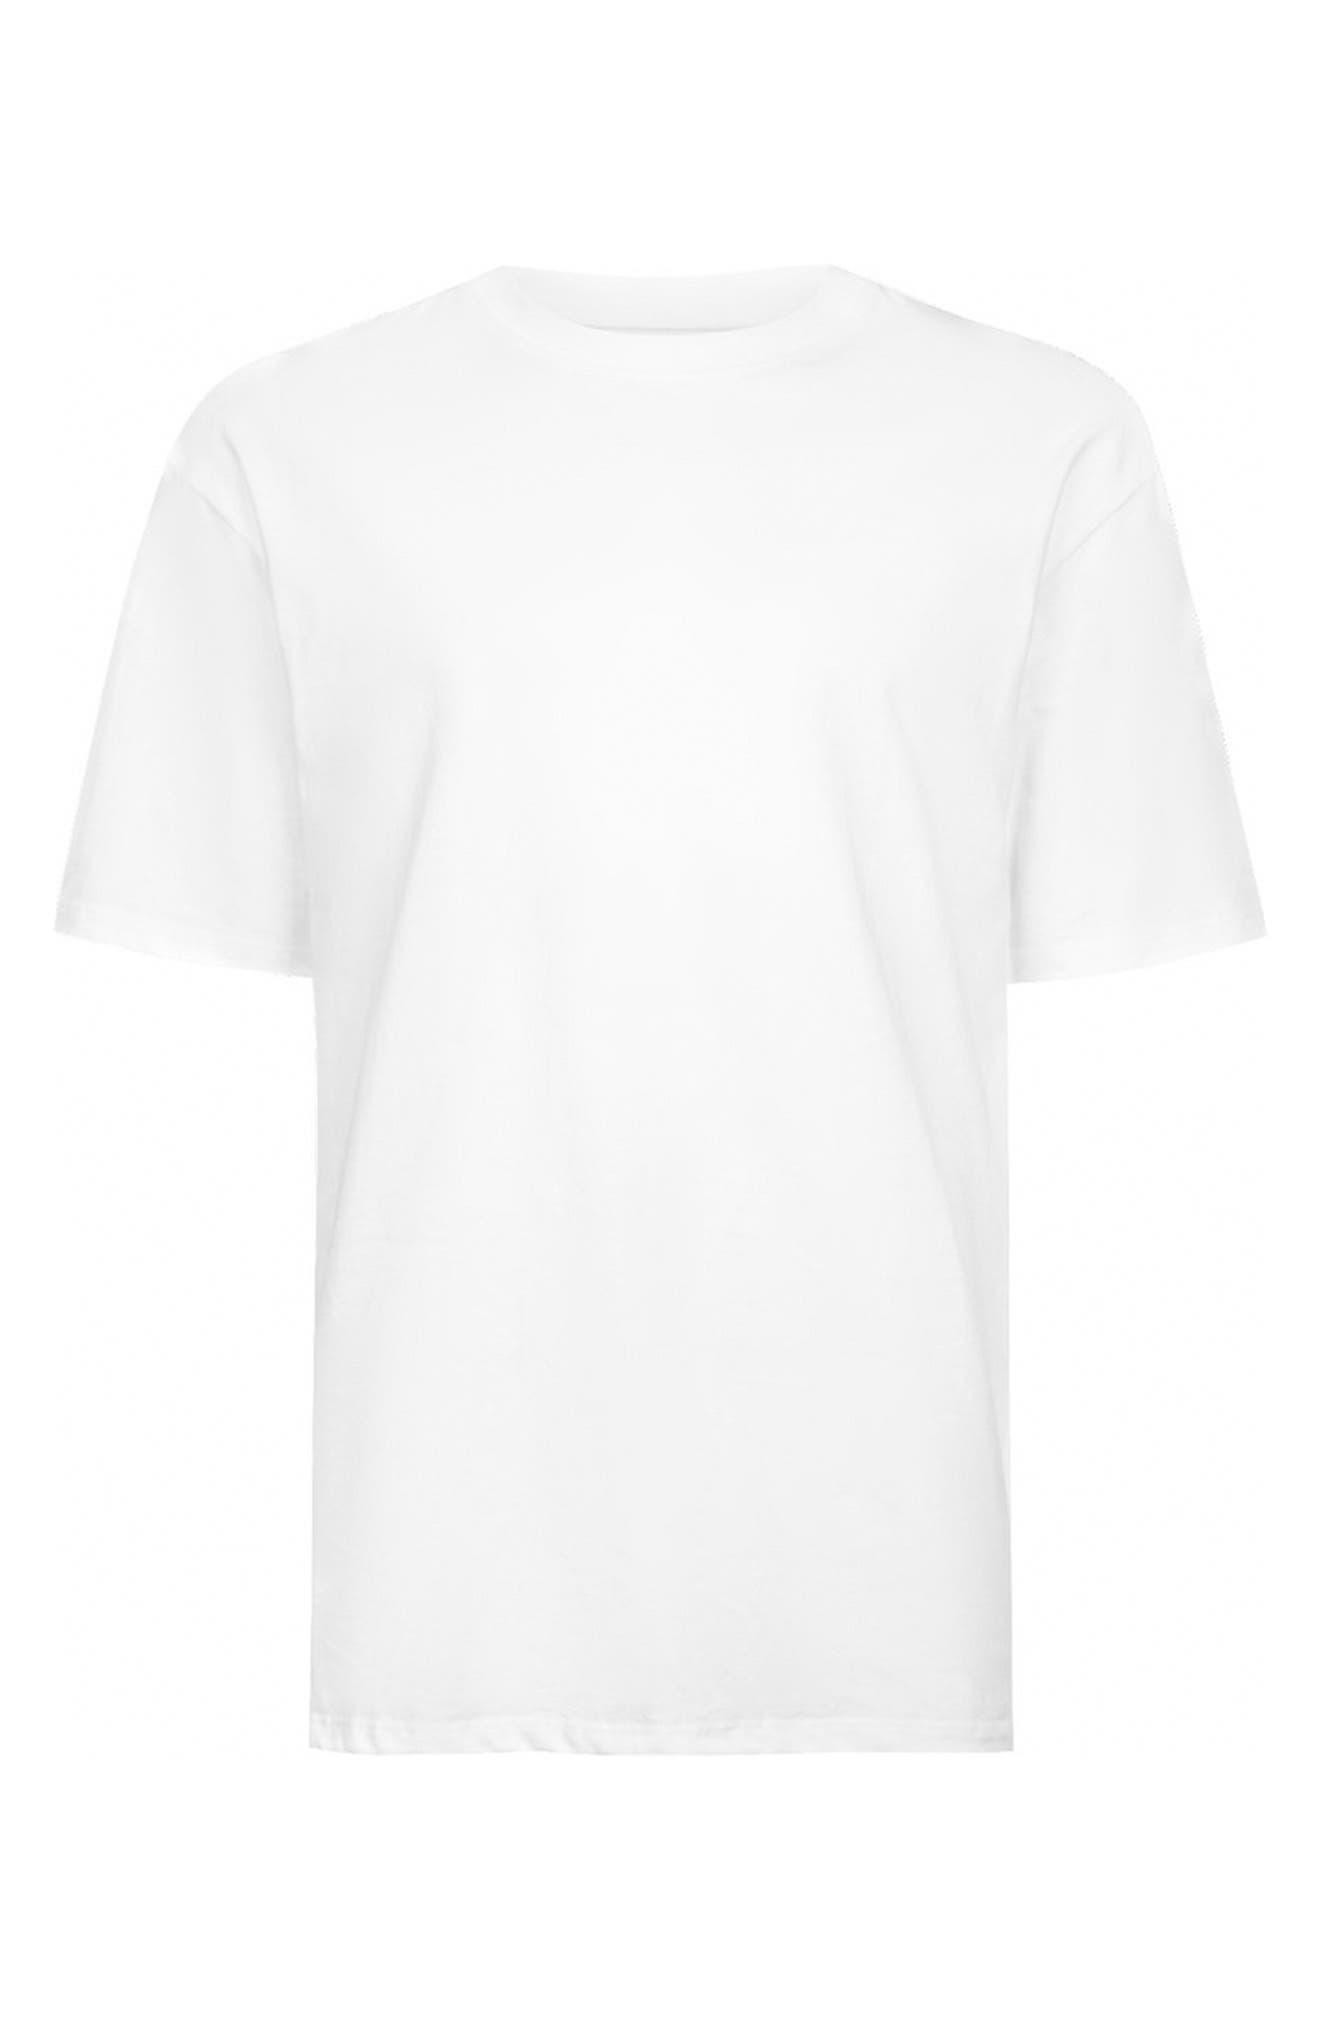 Oversize T-Shirt,                             Alternate thumbnail 4, color,                             White